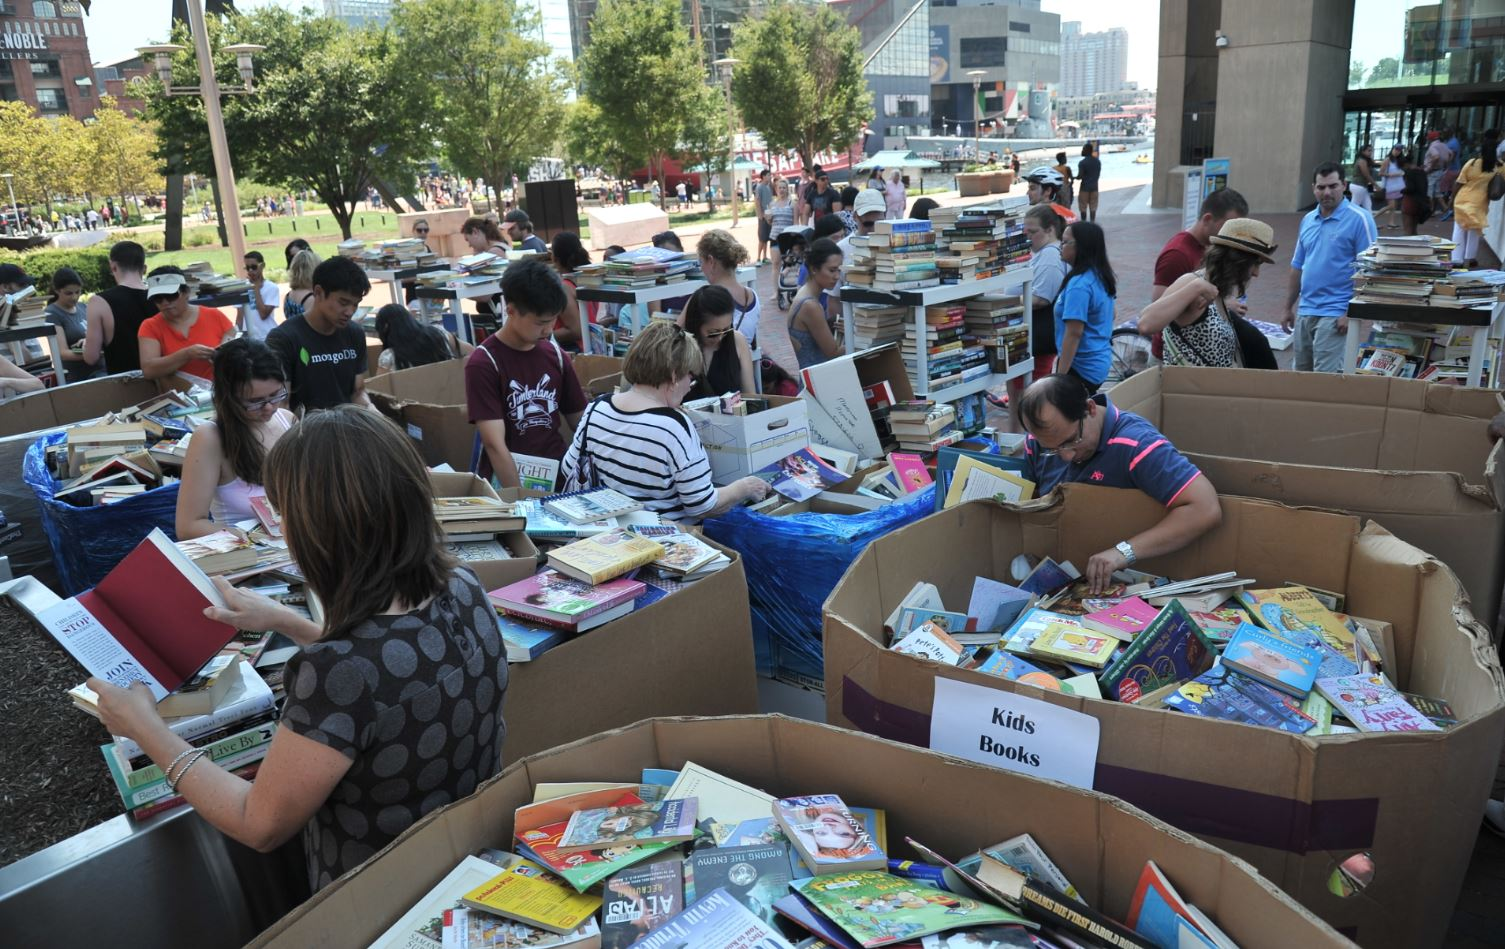 Book_Distribution_Baltimore.JPG